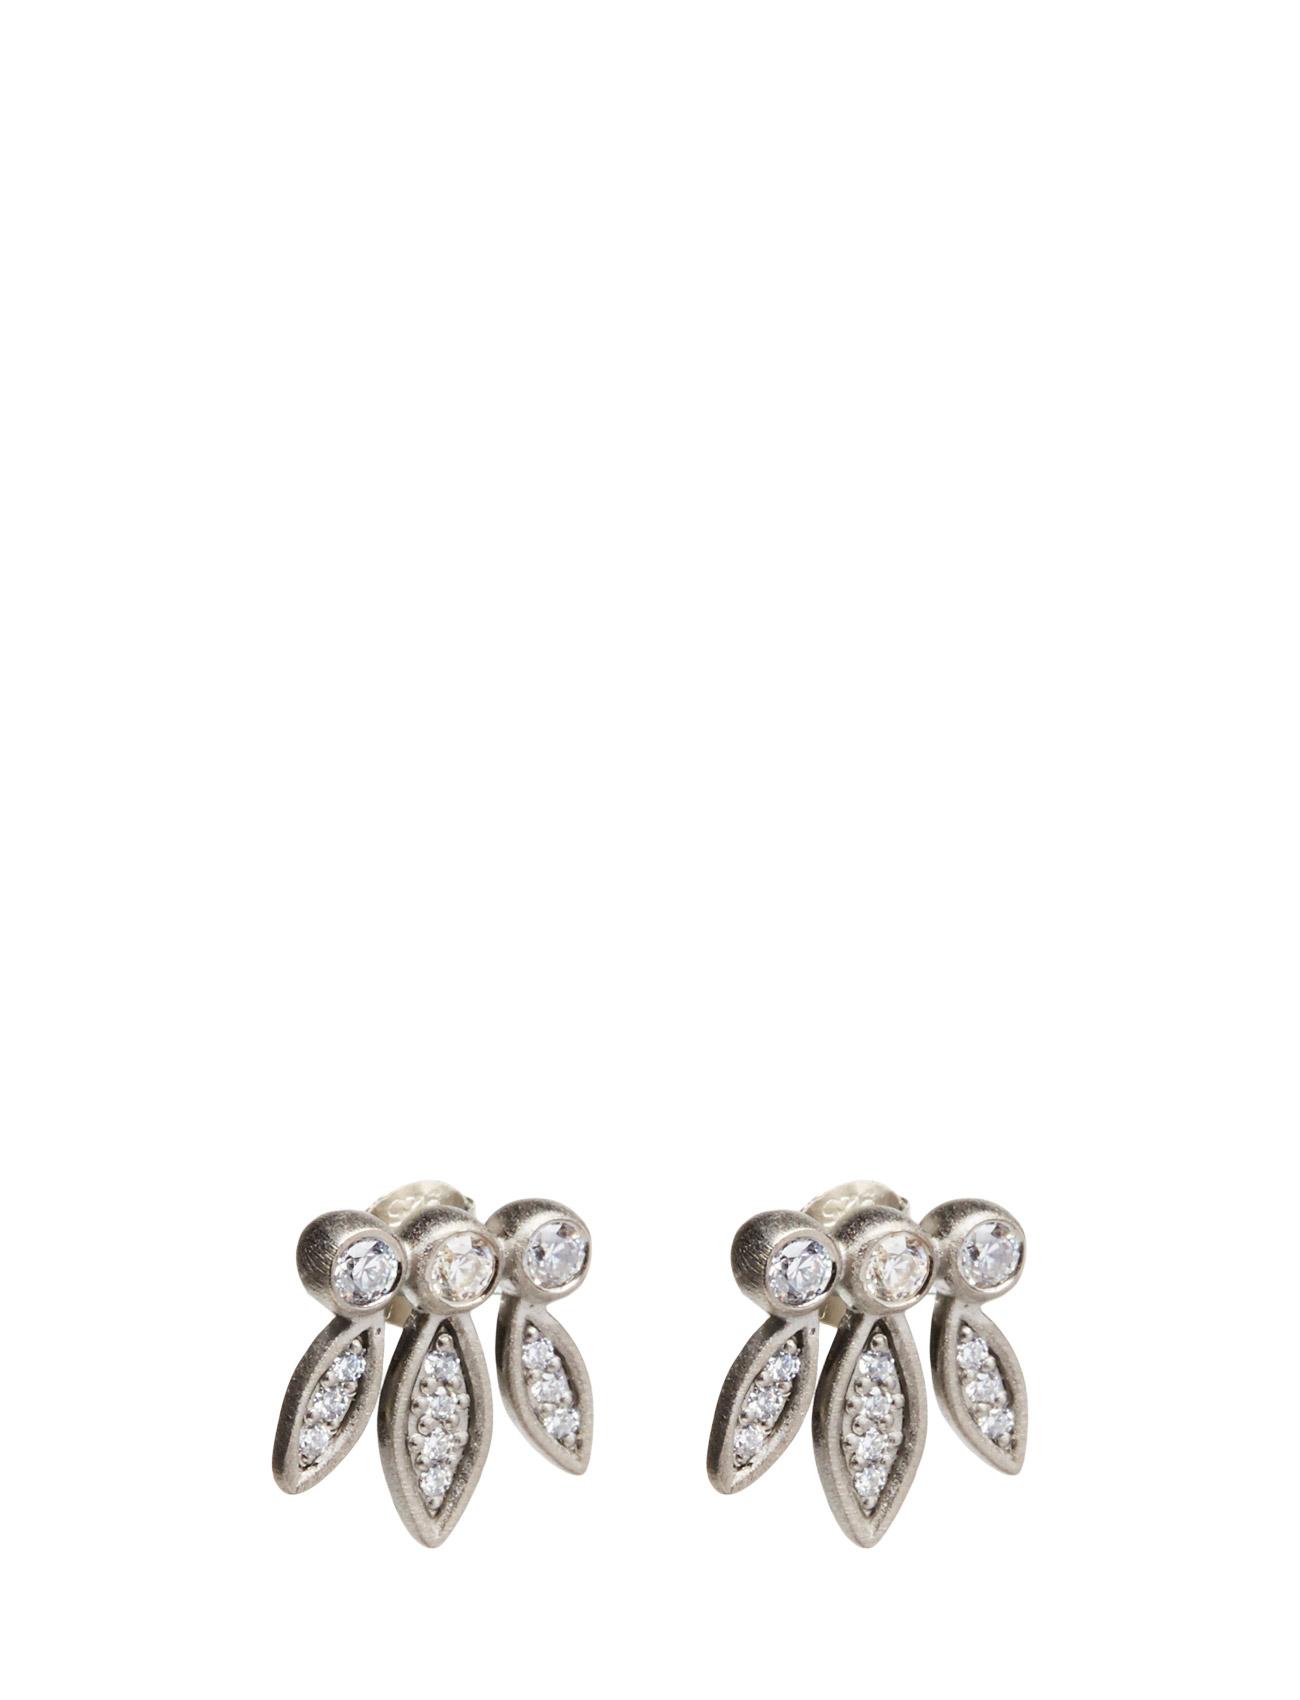 Loulou fra zabel jewellery på boozt.com dk